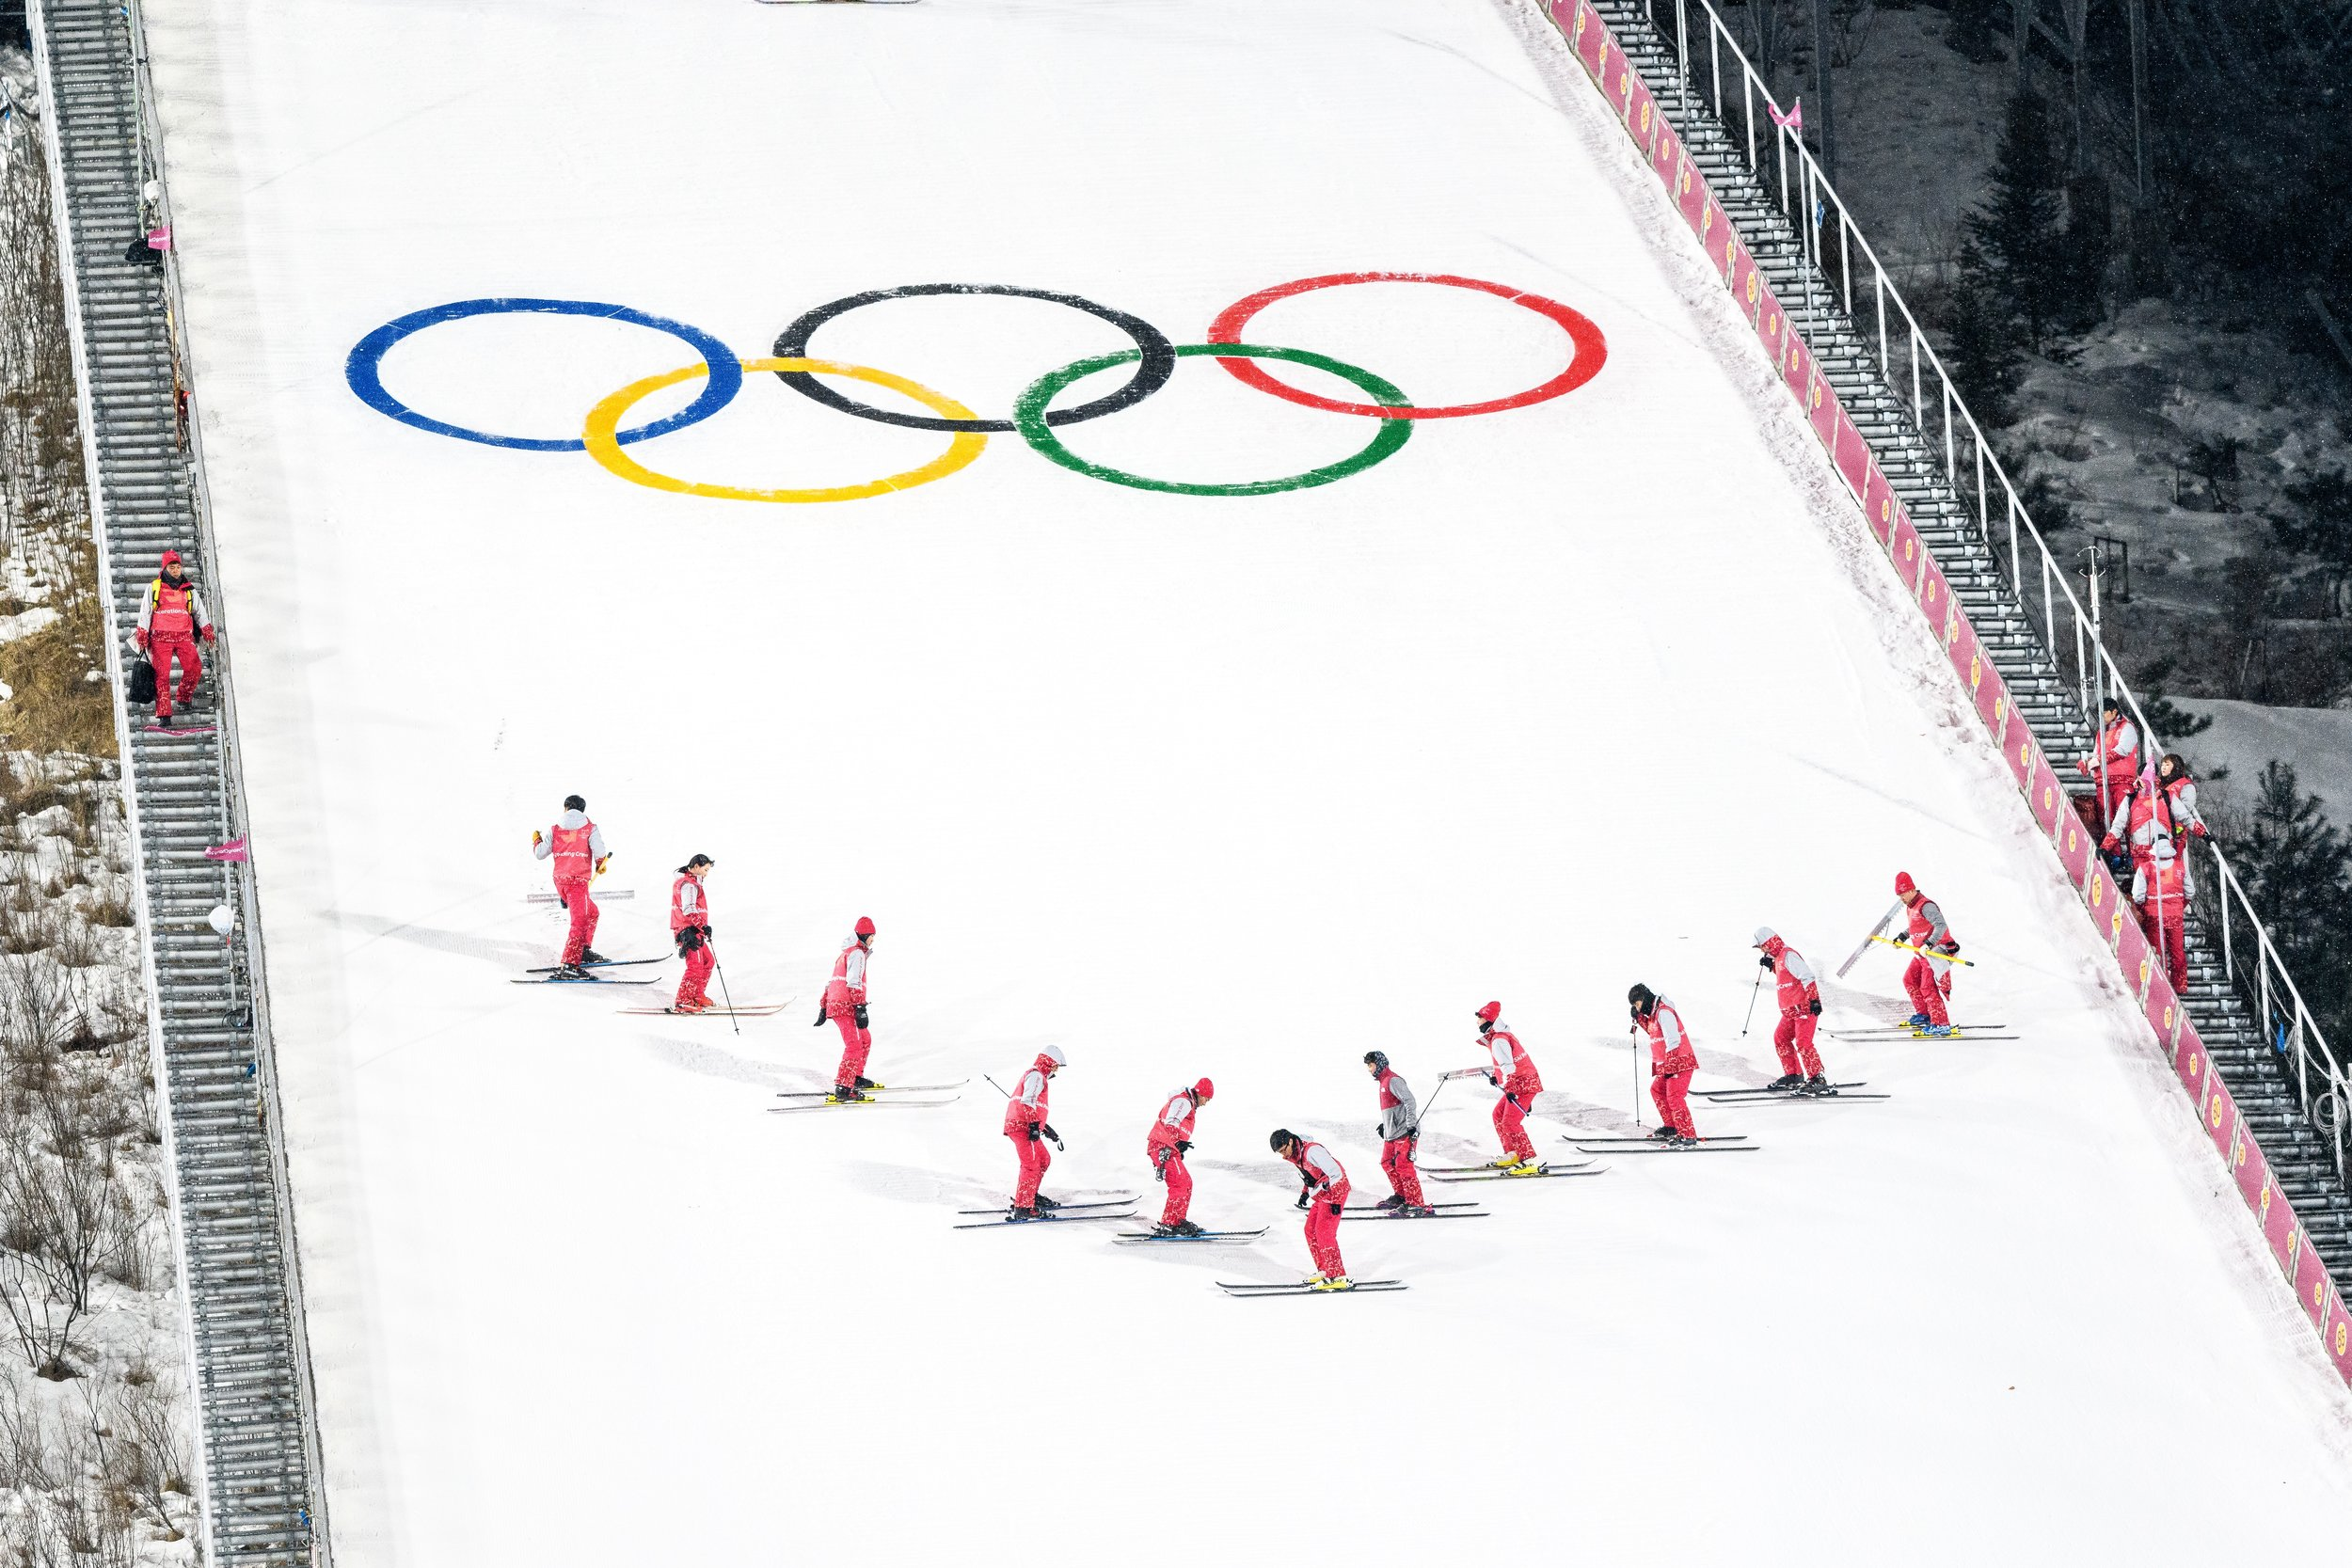 Pyeongchang Winter Games 2018 (Photo by Vytautas Dranginis)